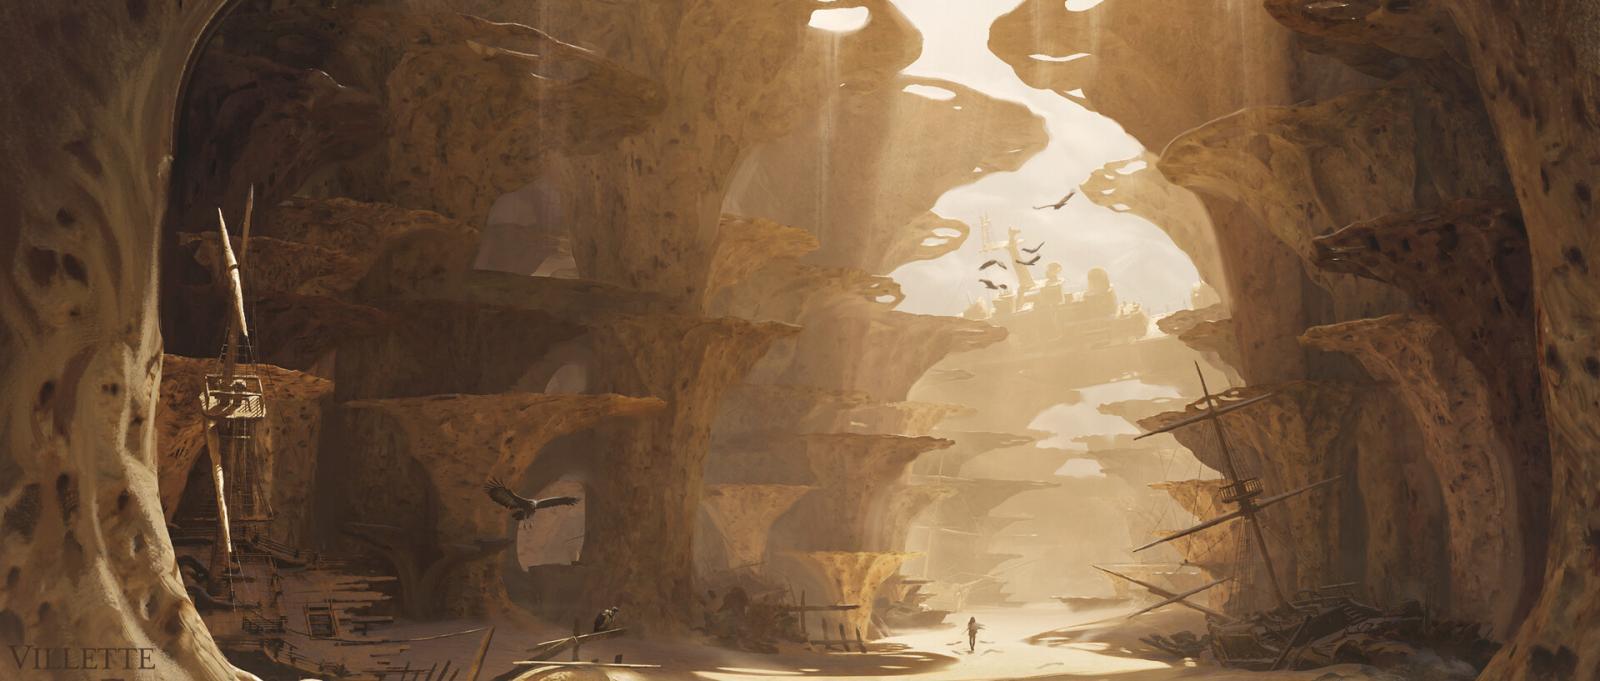 karine-villette-coral-canyon-01-s.jpg